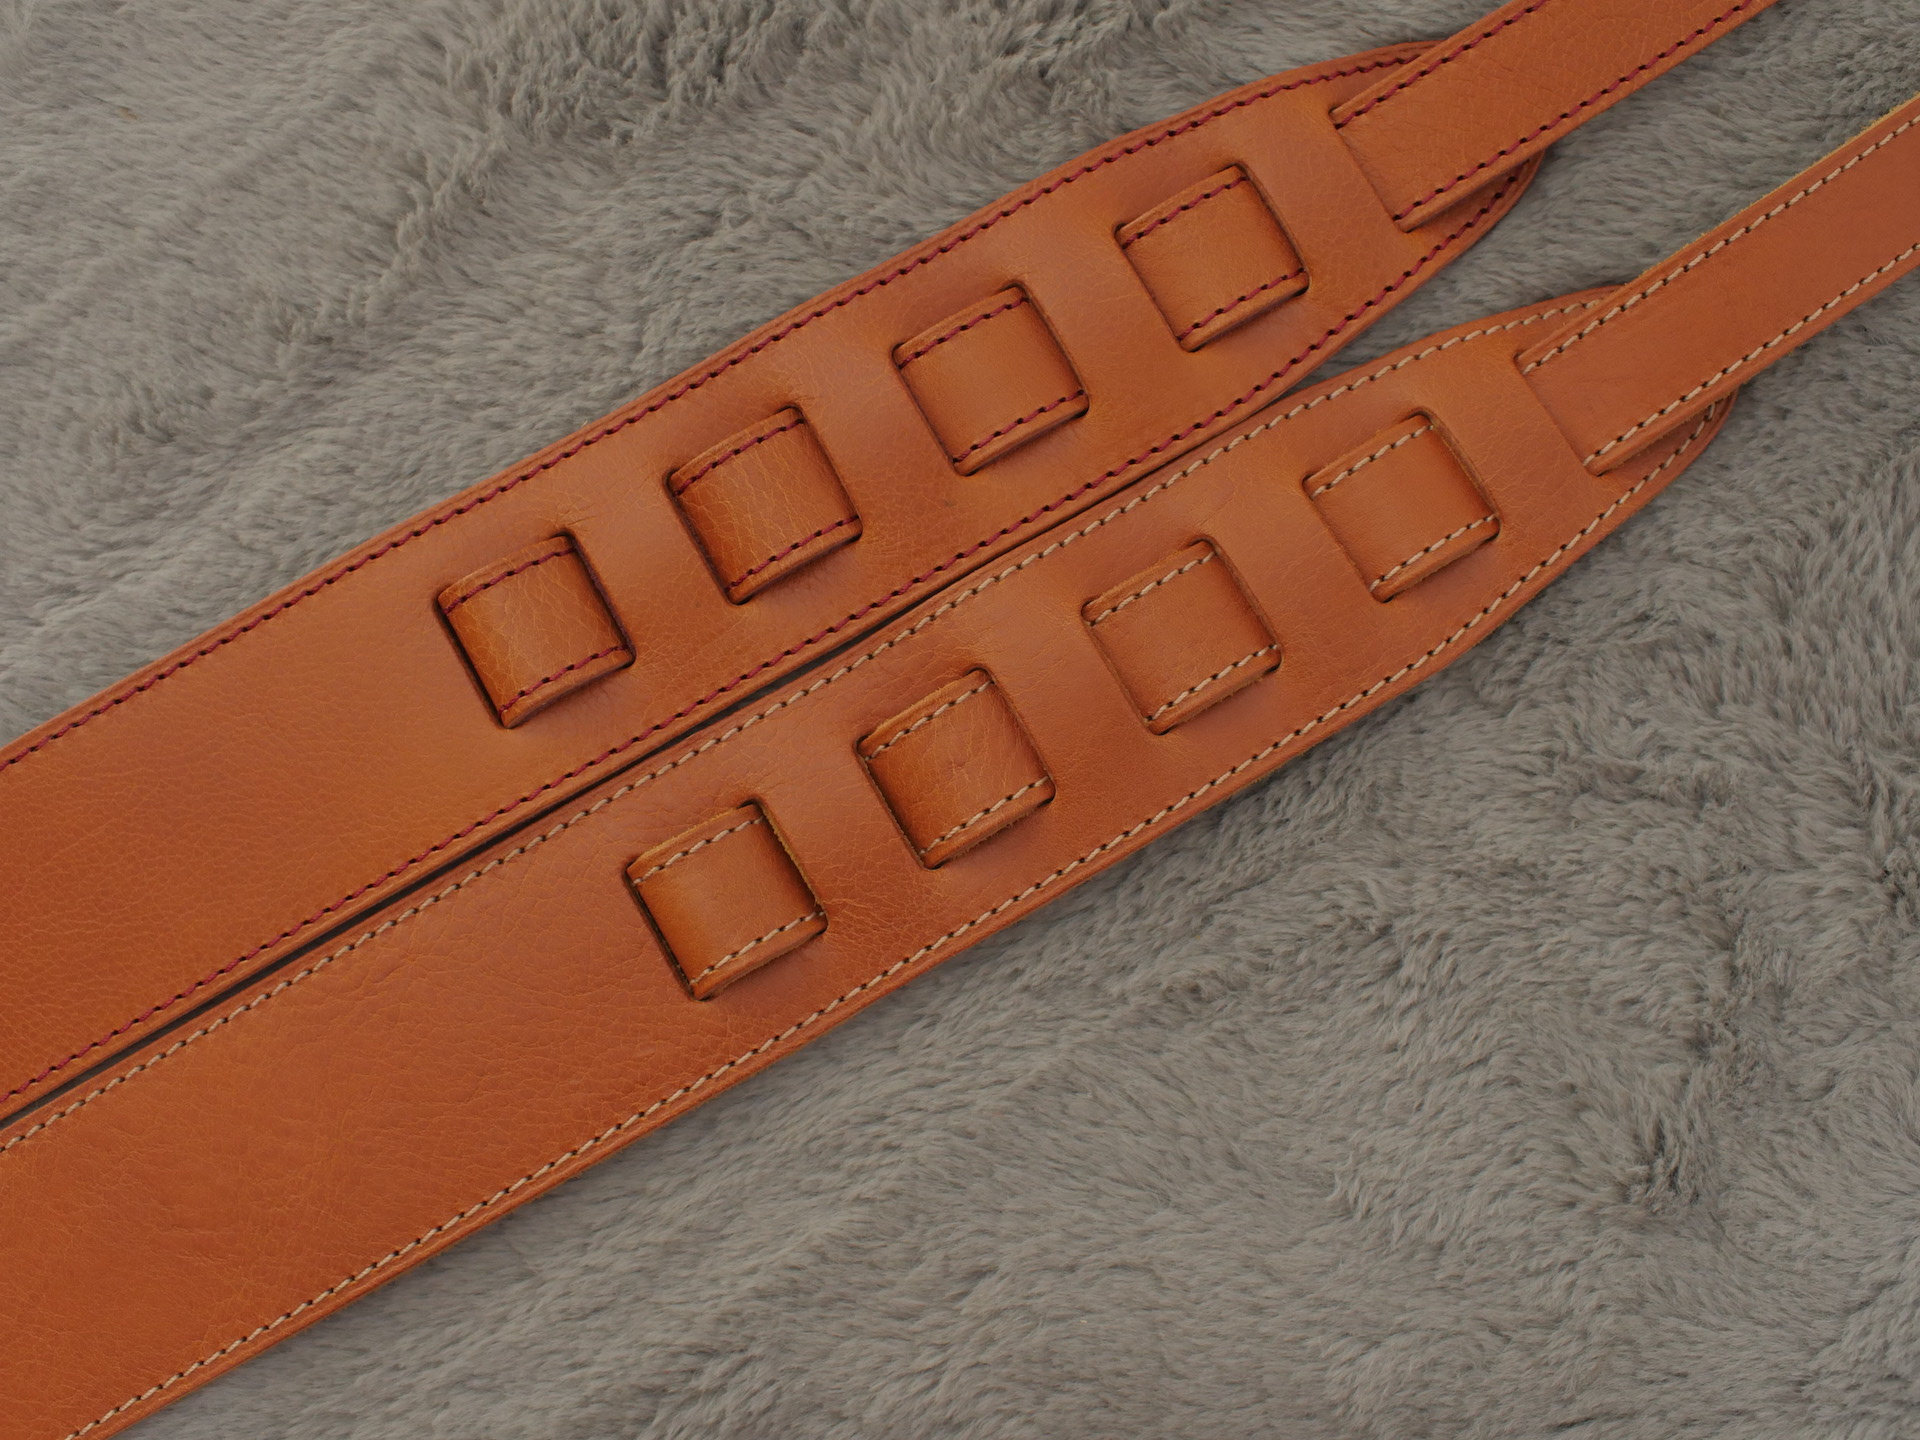 Heistercamp Leedon-Tor Leather Guitar Strap